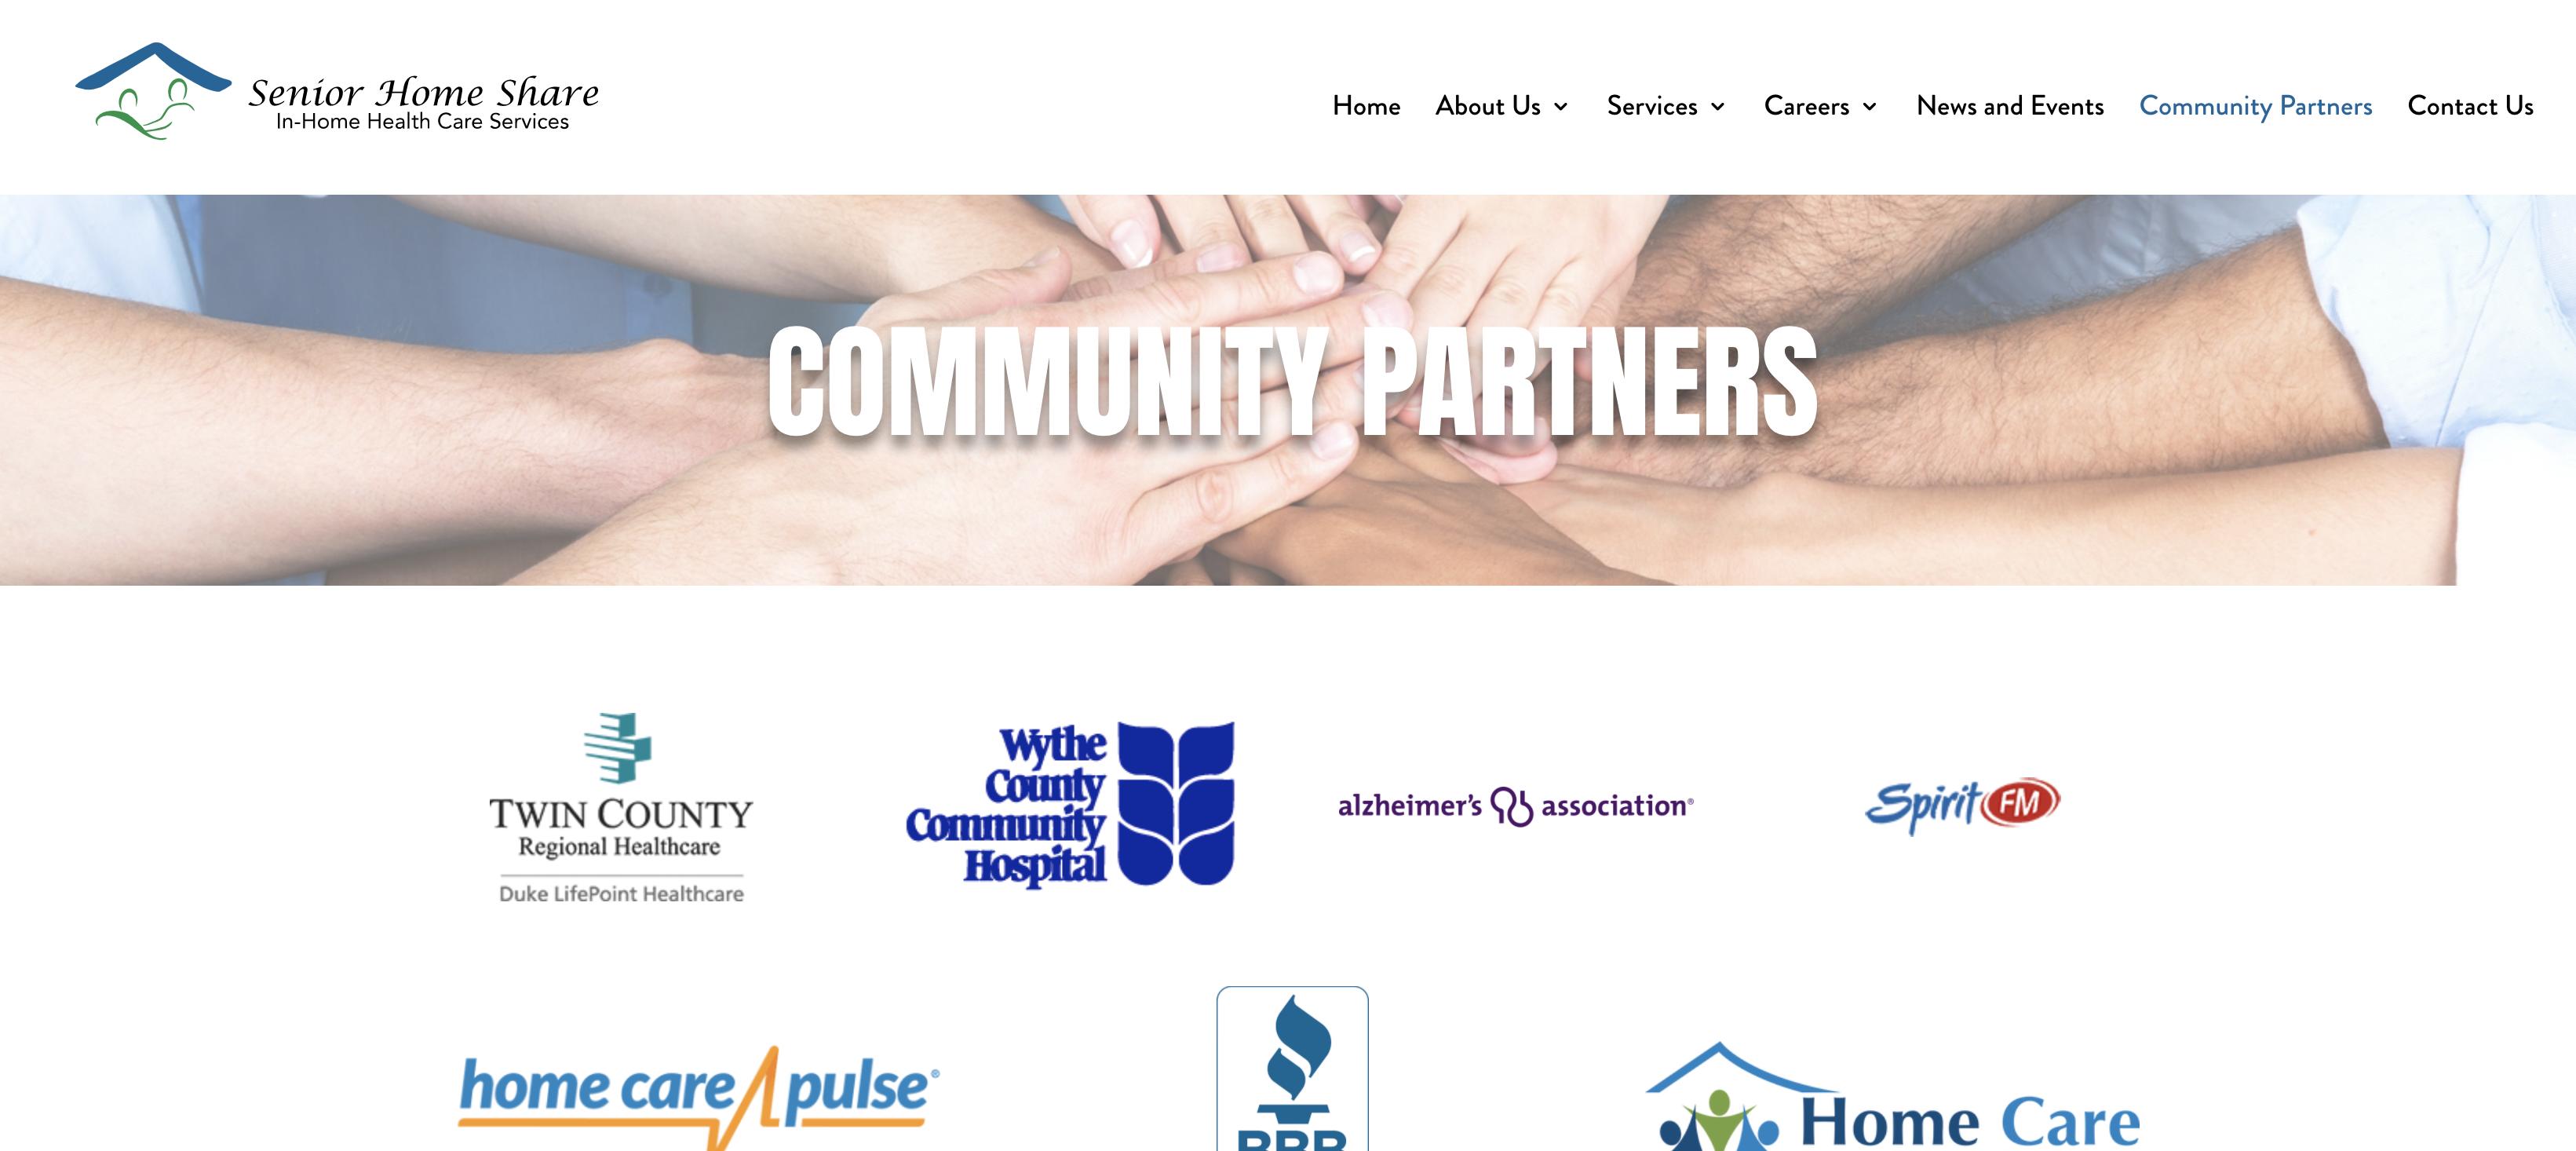 Community Partners Galax VA